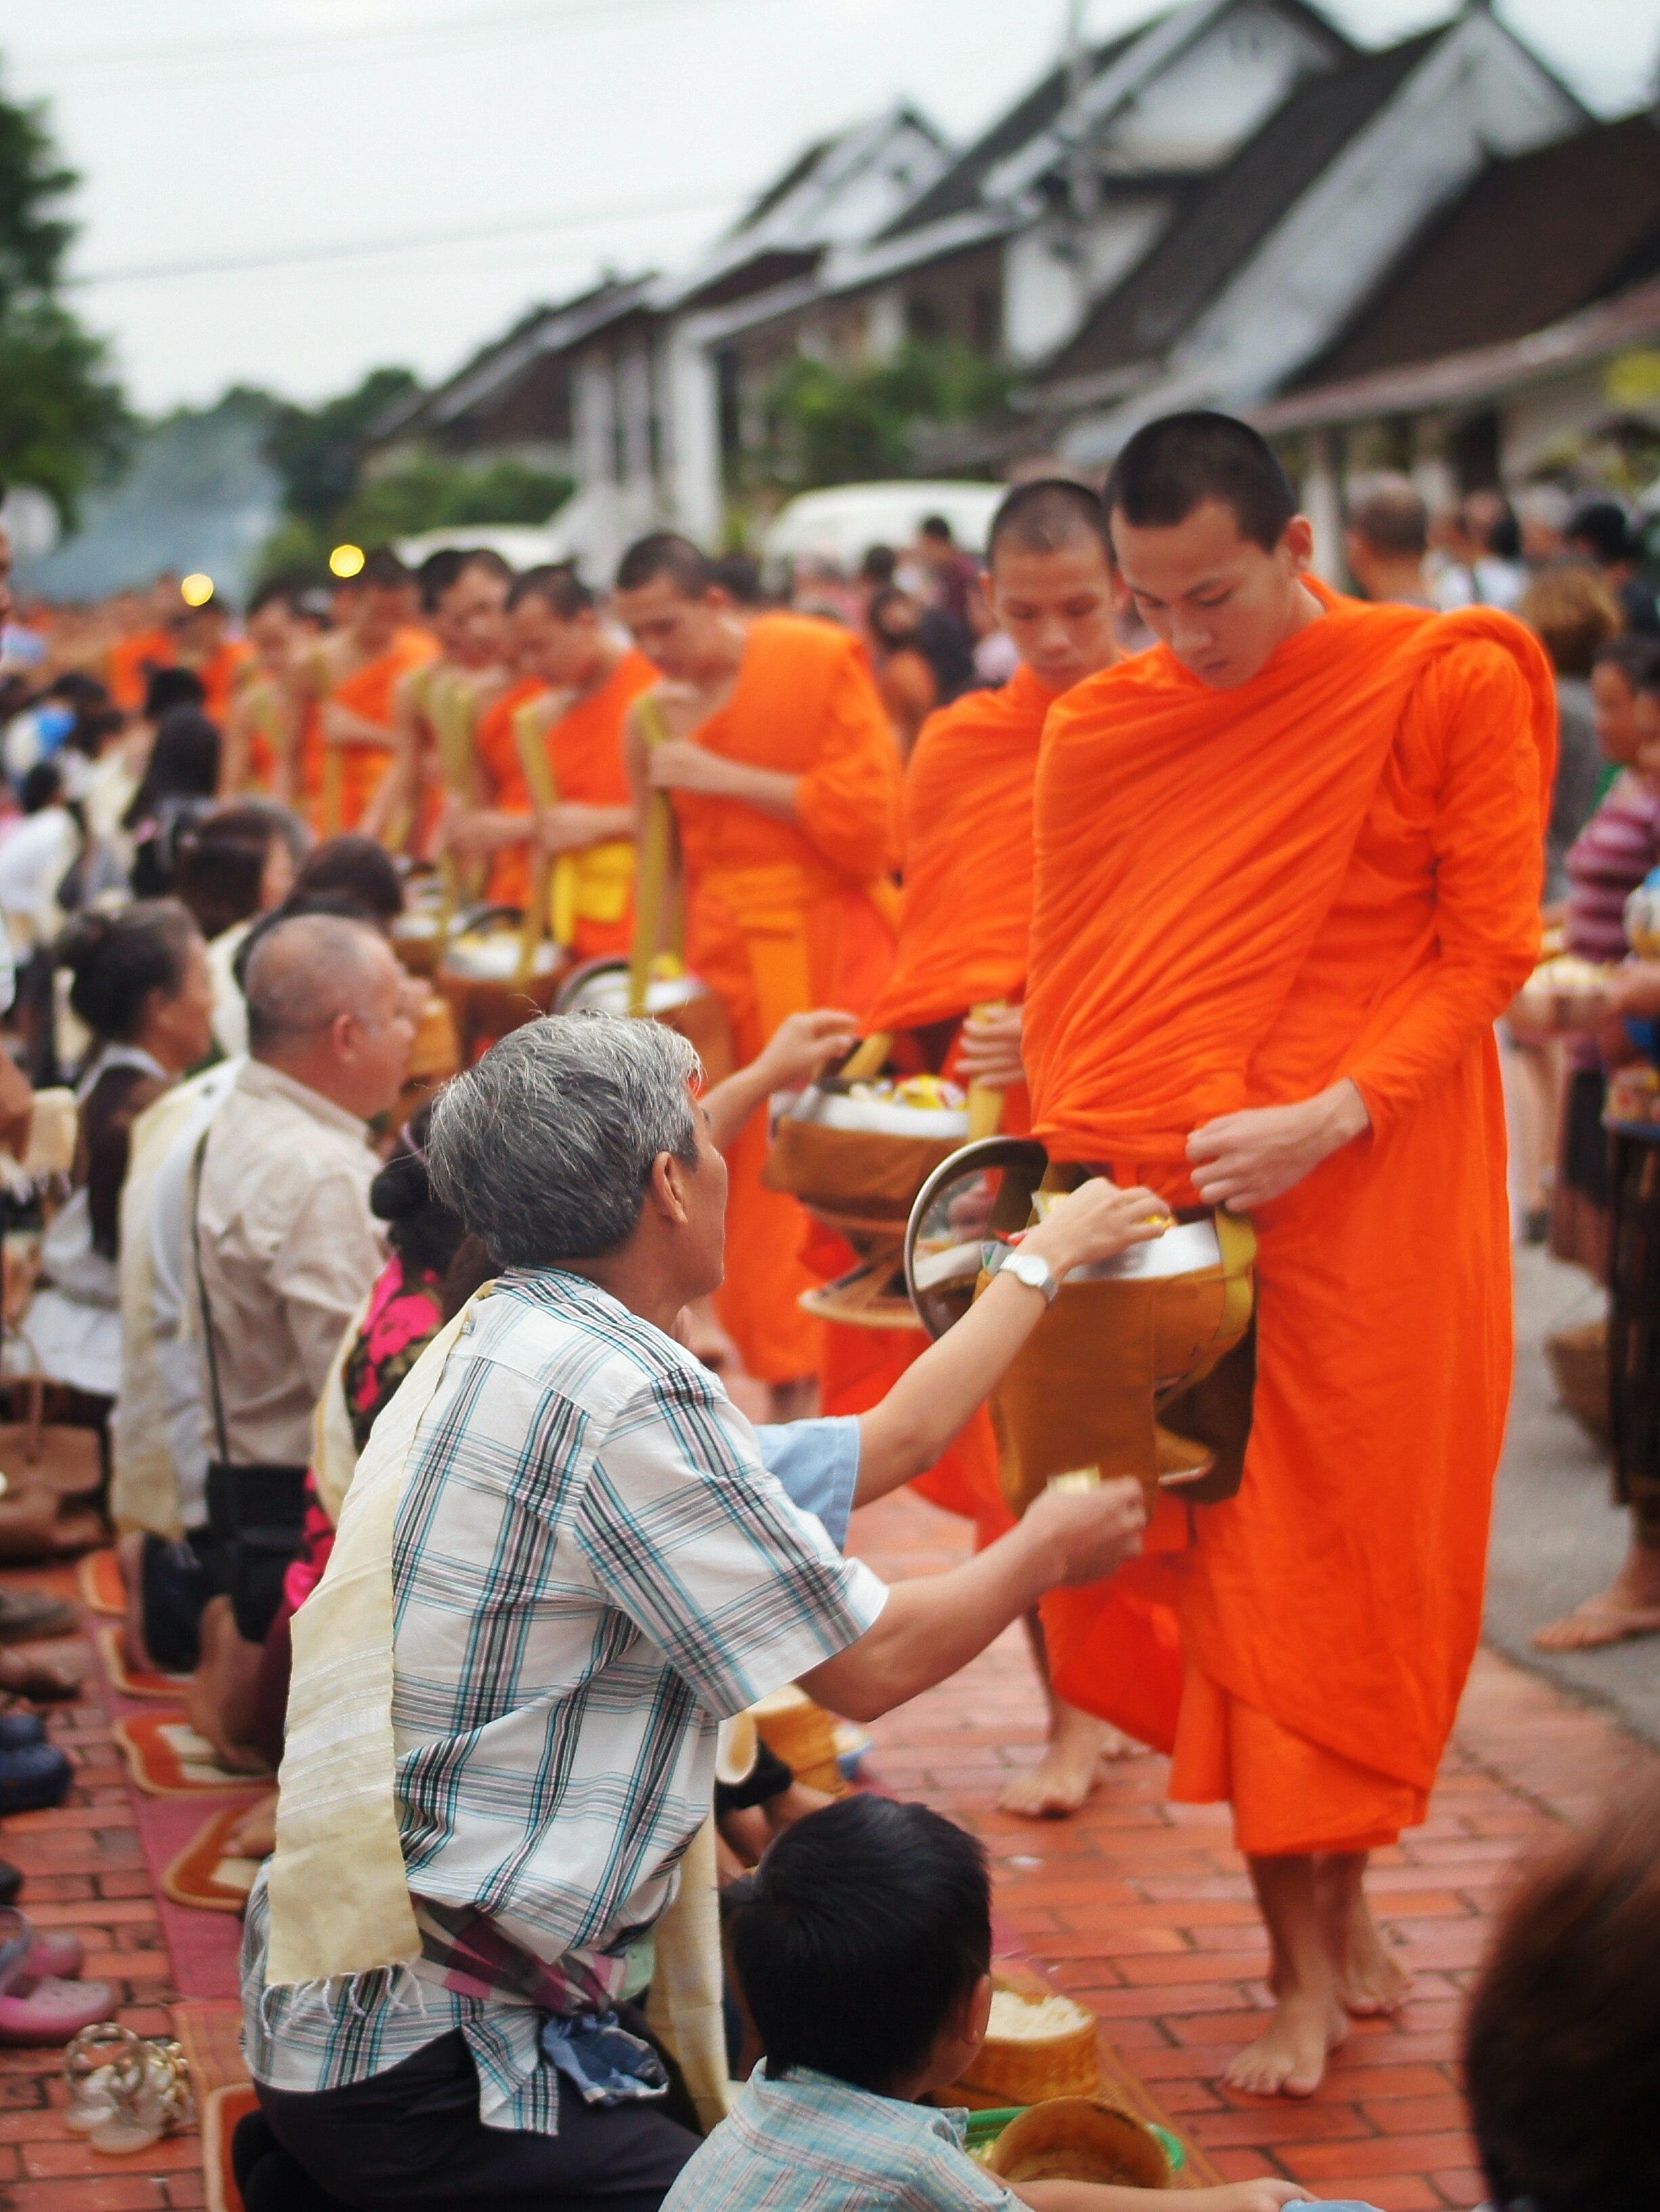 Alms ceremony, Luang Prabang, Laos